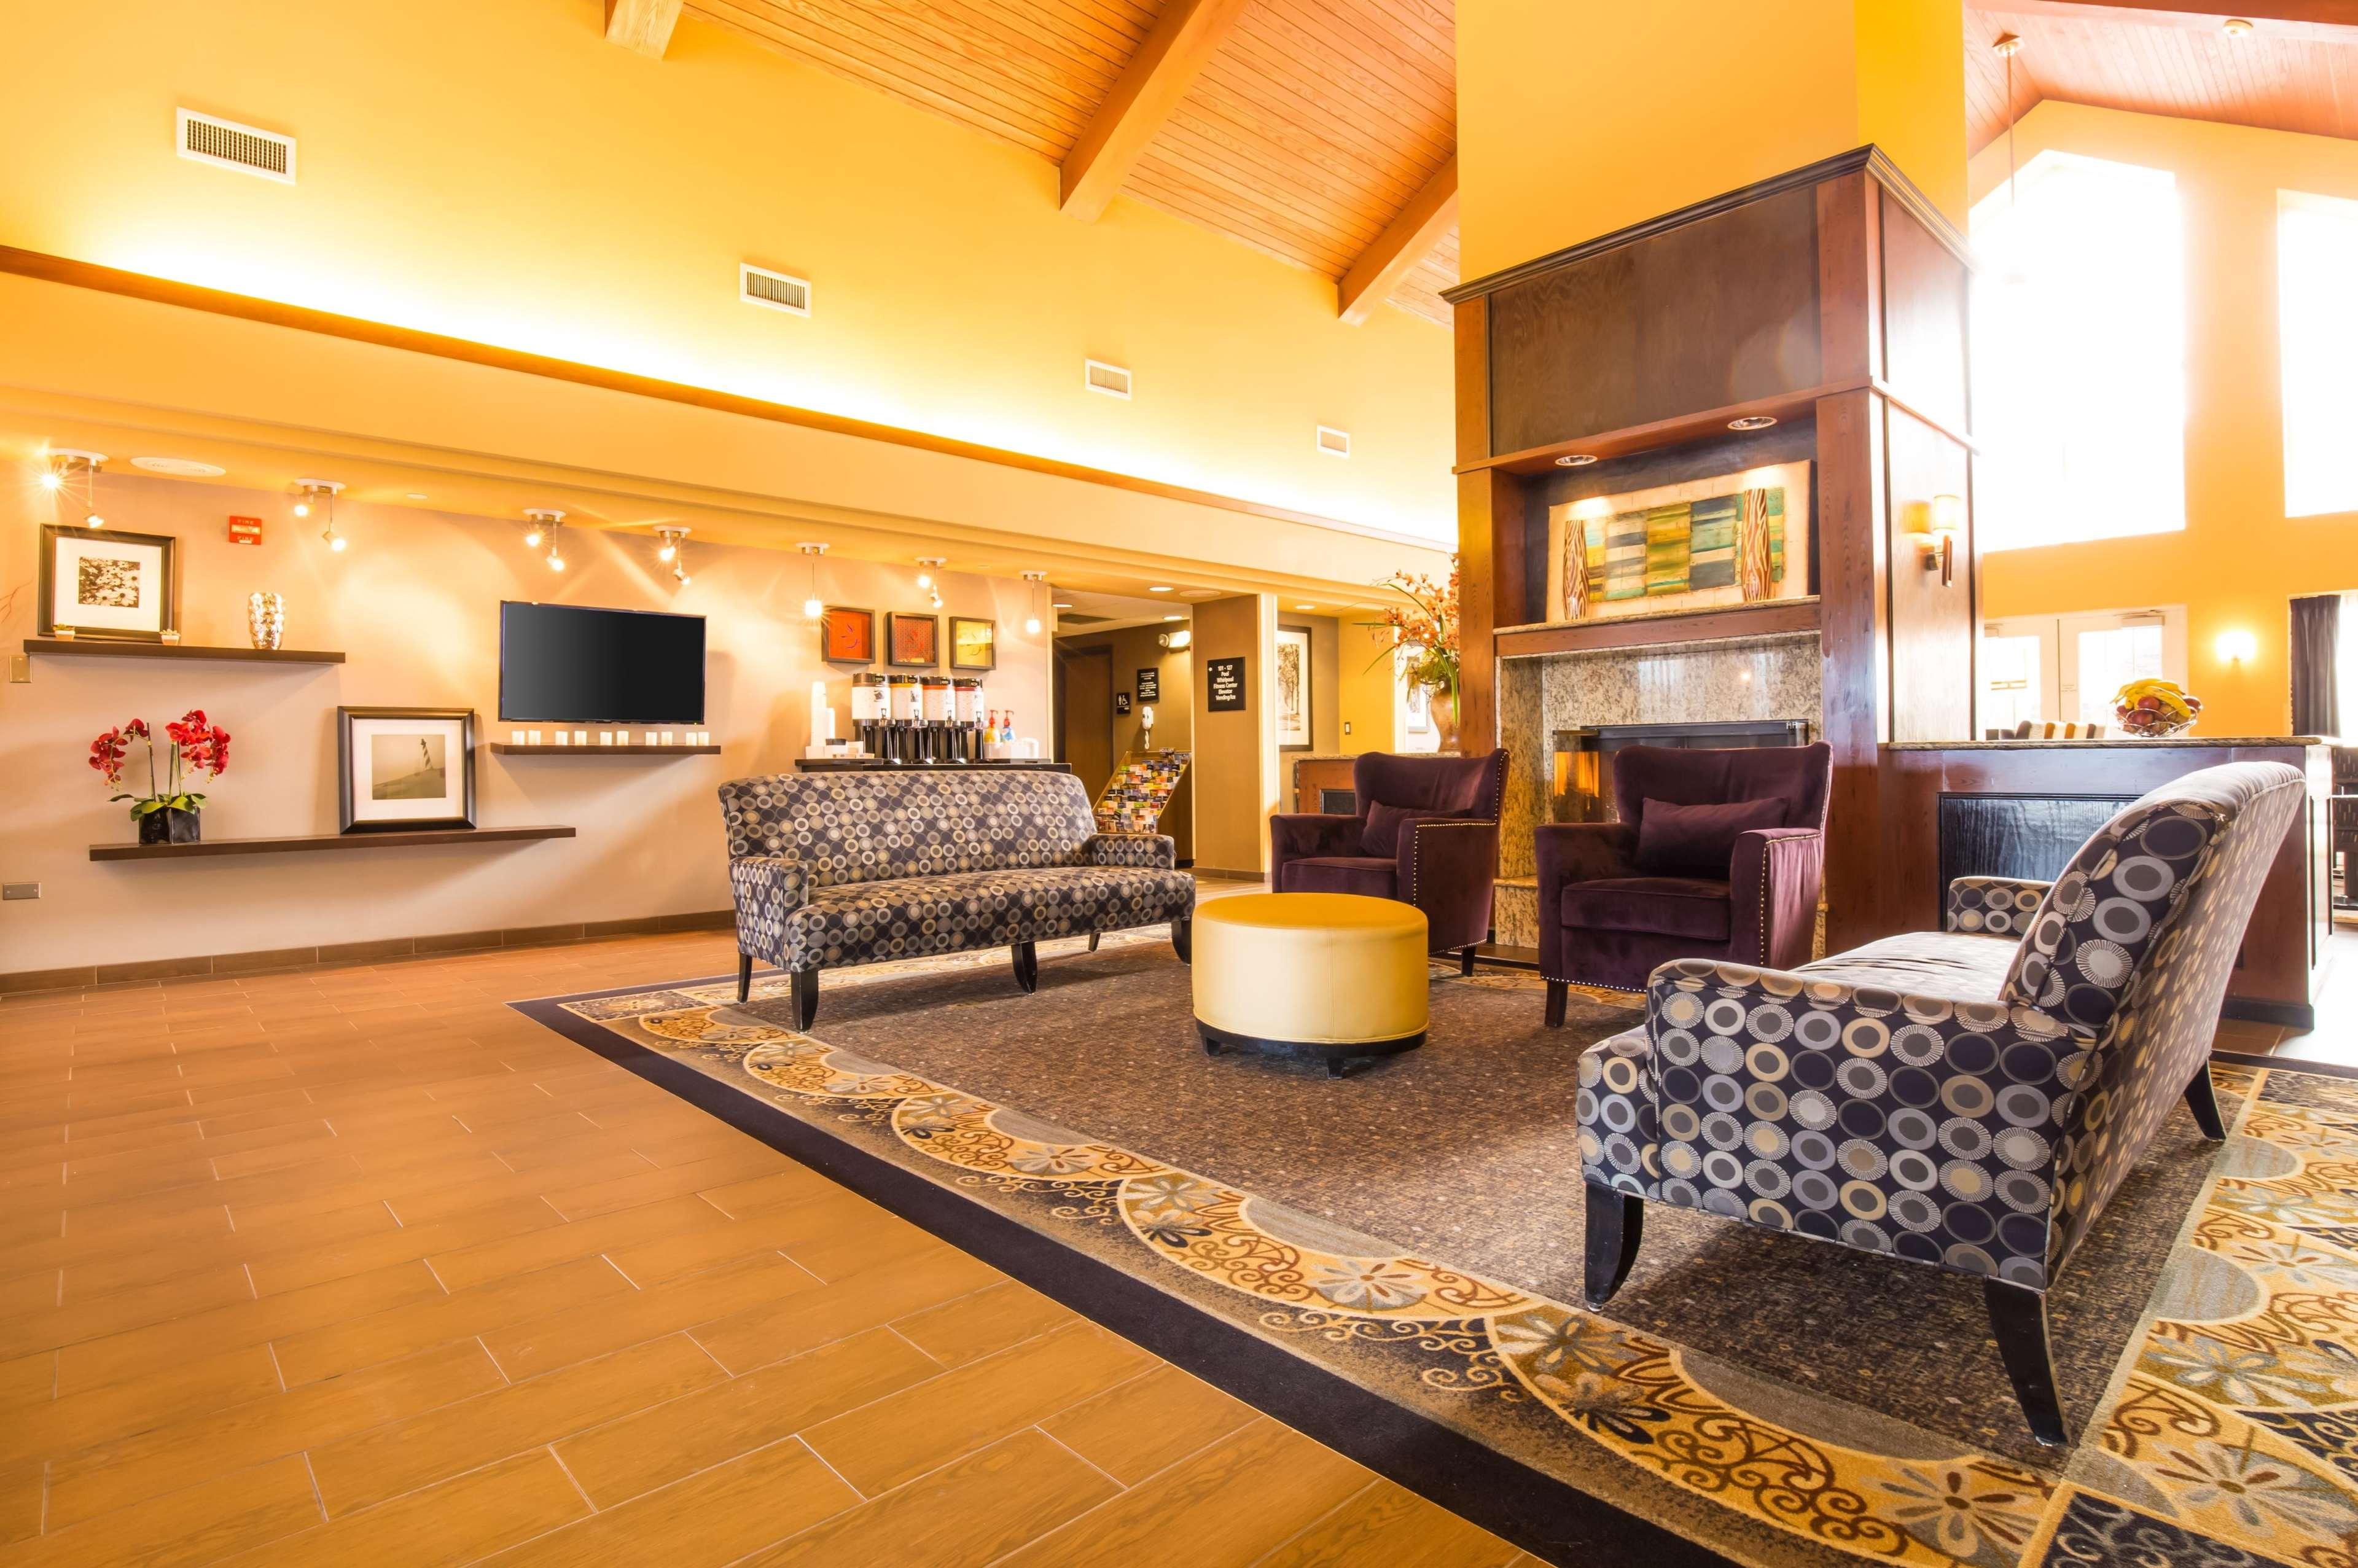 Hampton Inn & Suites Chicago/Hoffman Estates image 23